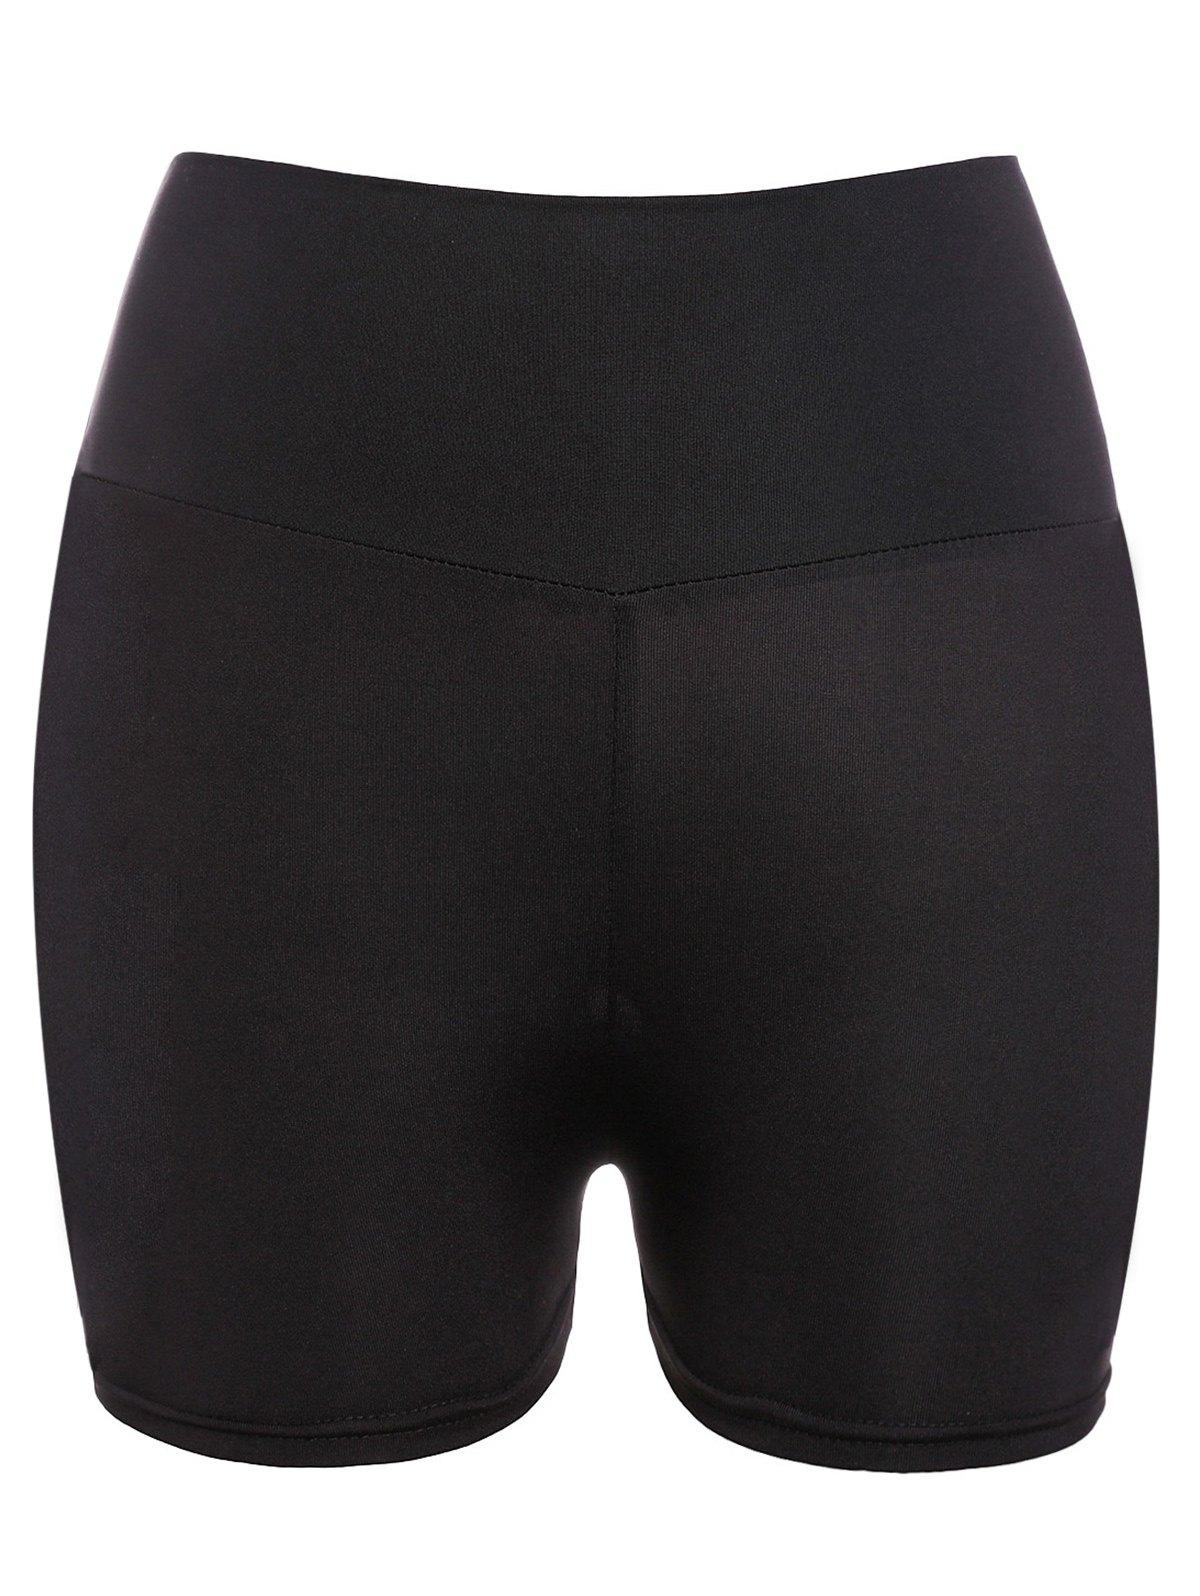 Elastic Waist Skinny Black Yoga Shorts